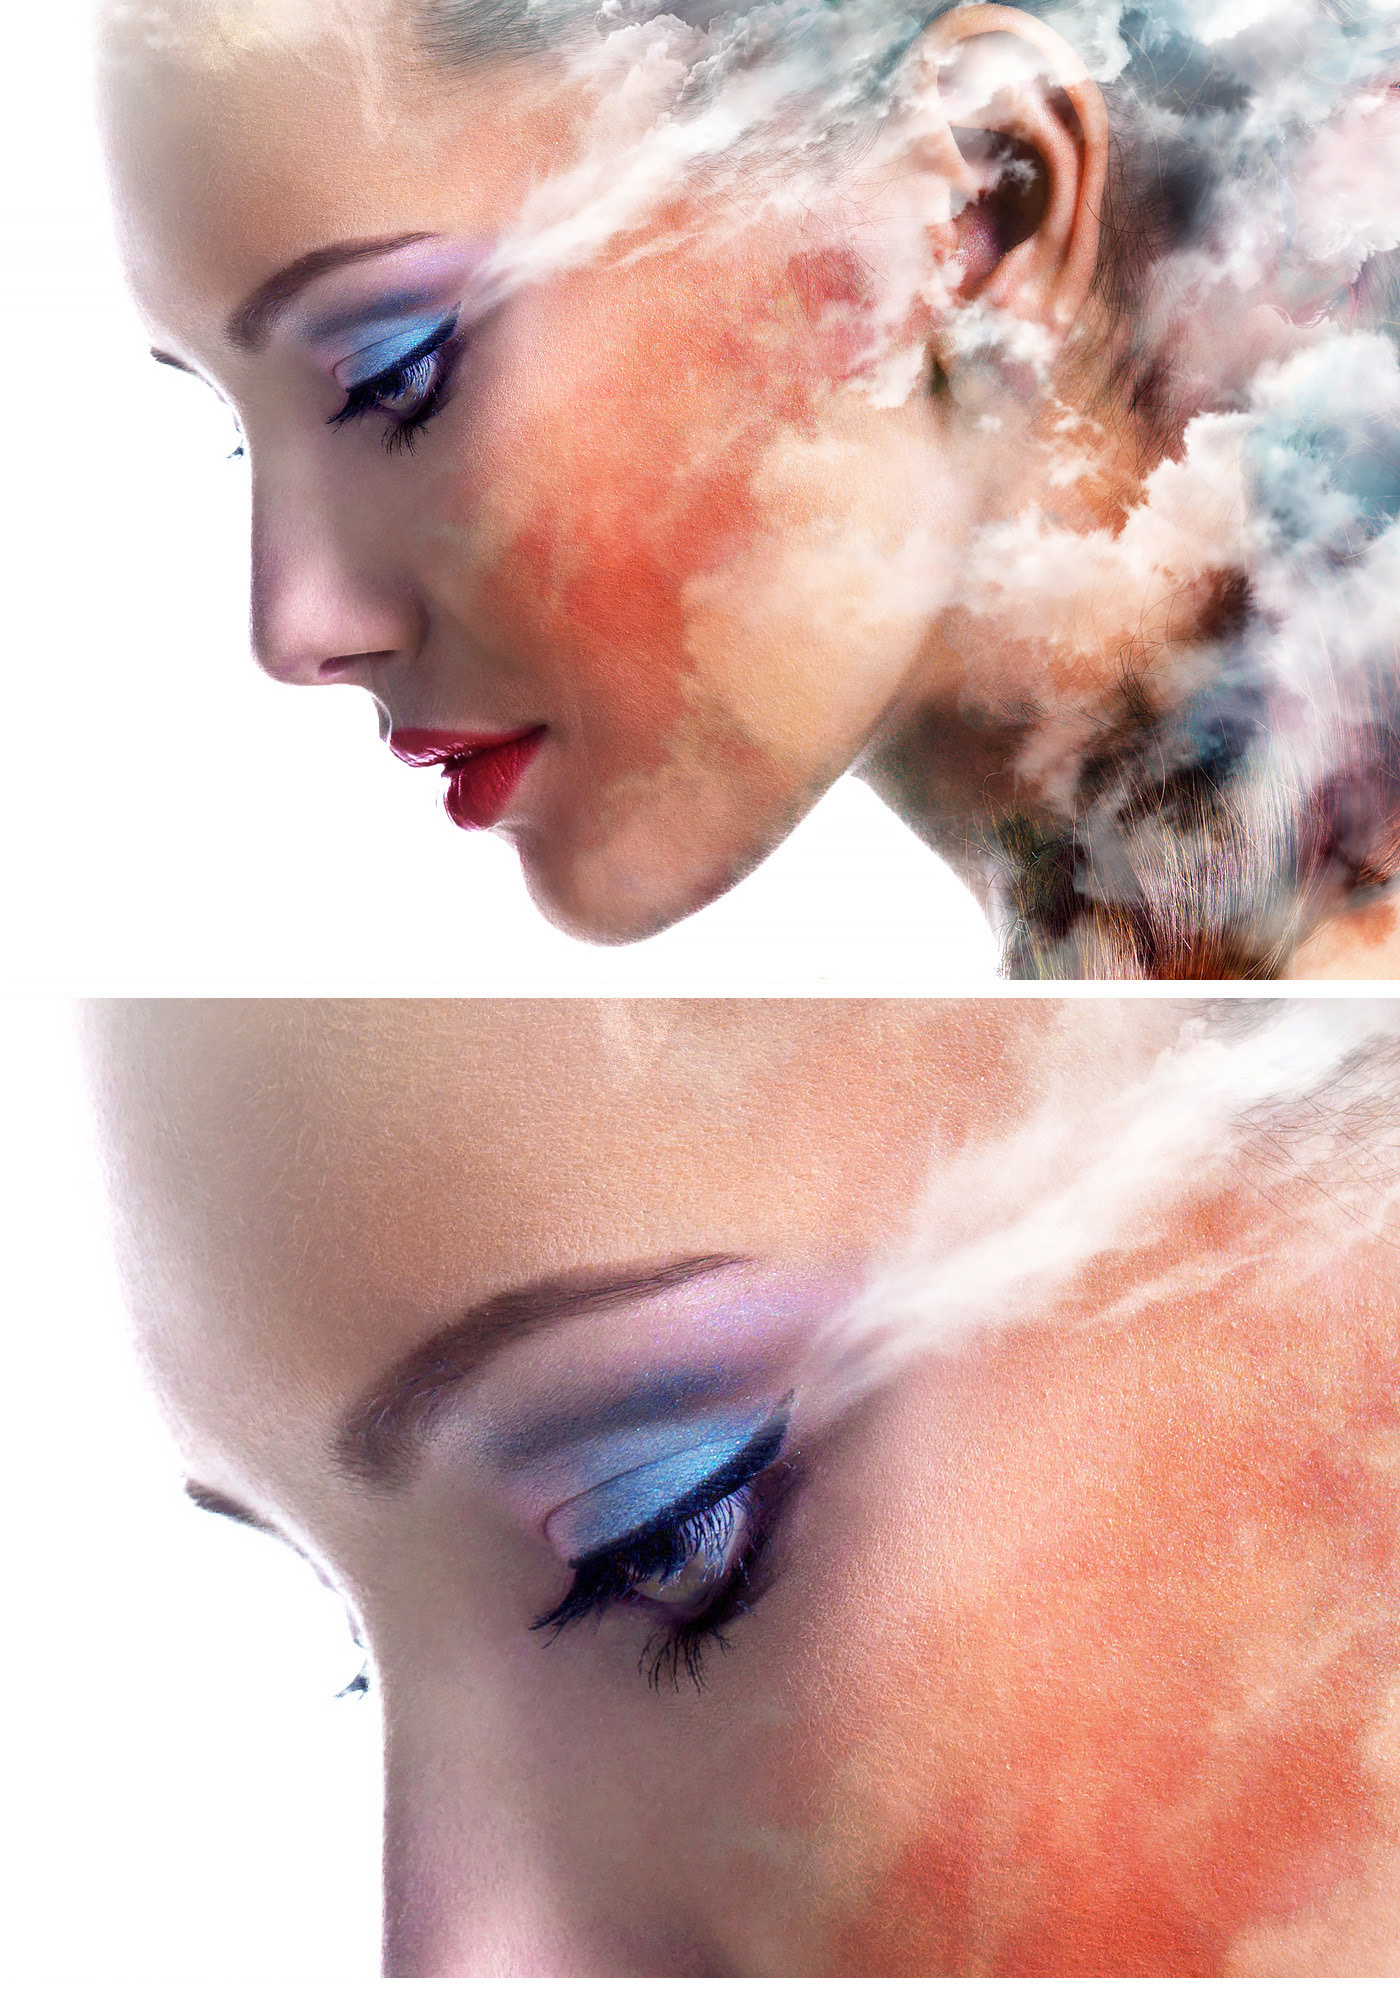 gaomon m106K graphic tablet girl beauty watercolor clouds Fashion  Emi Haze emi haze art